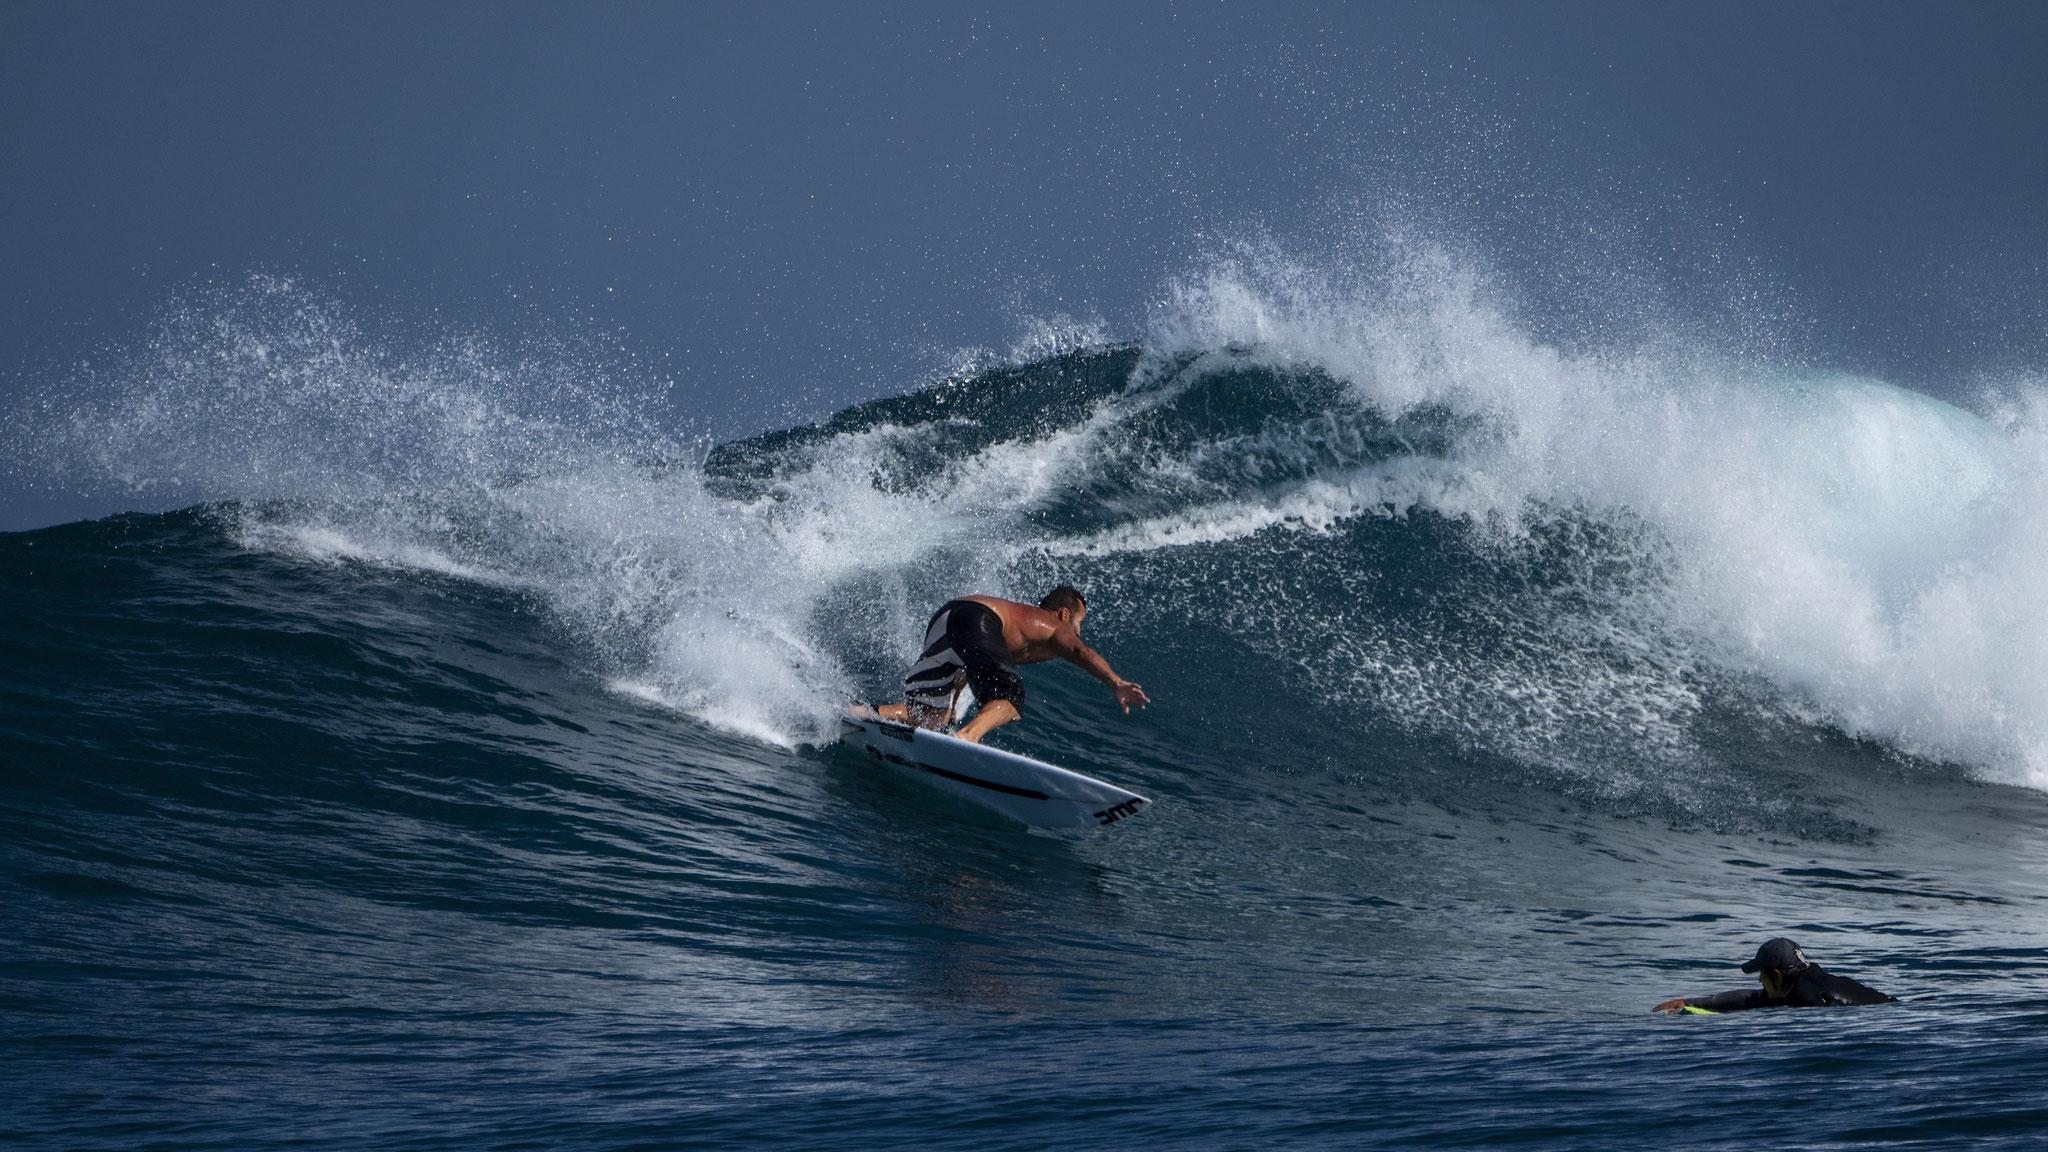 Justin West Coaching credit: Roger Sharp, Carve Surfing Magazine